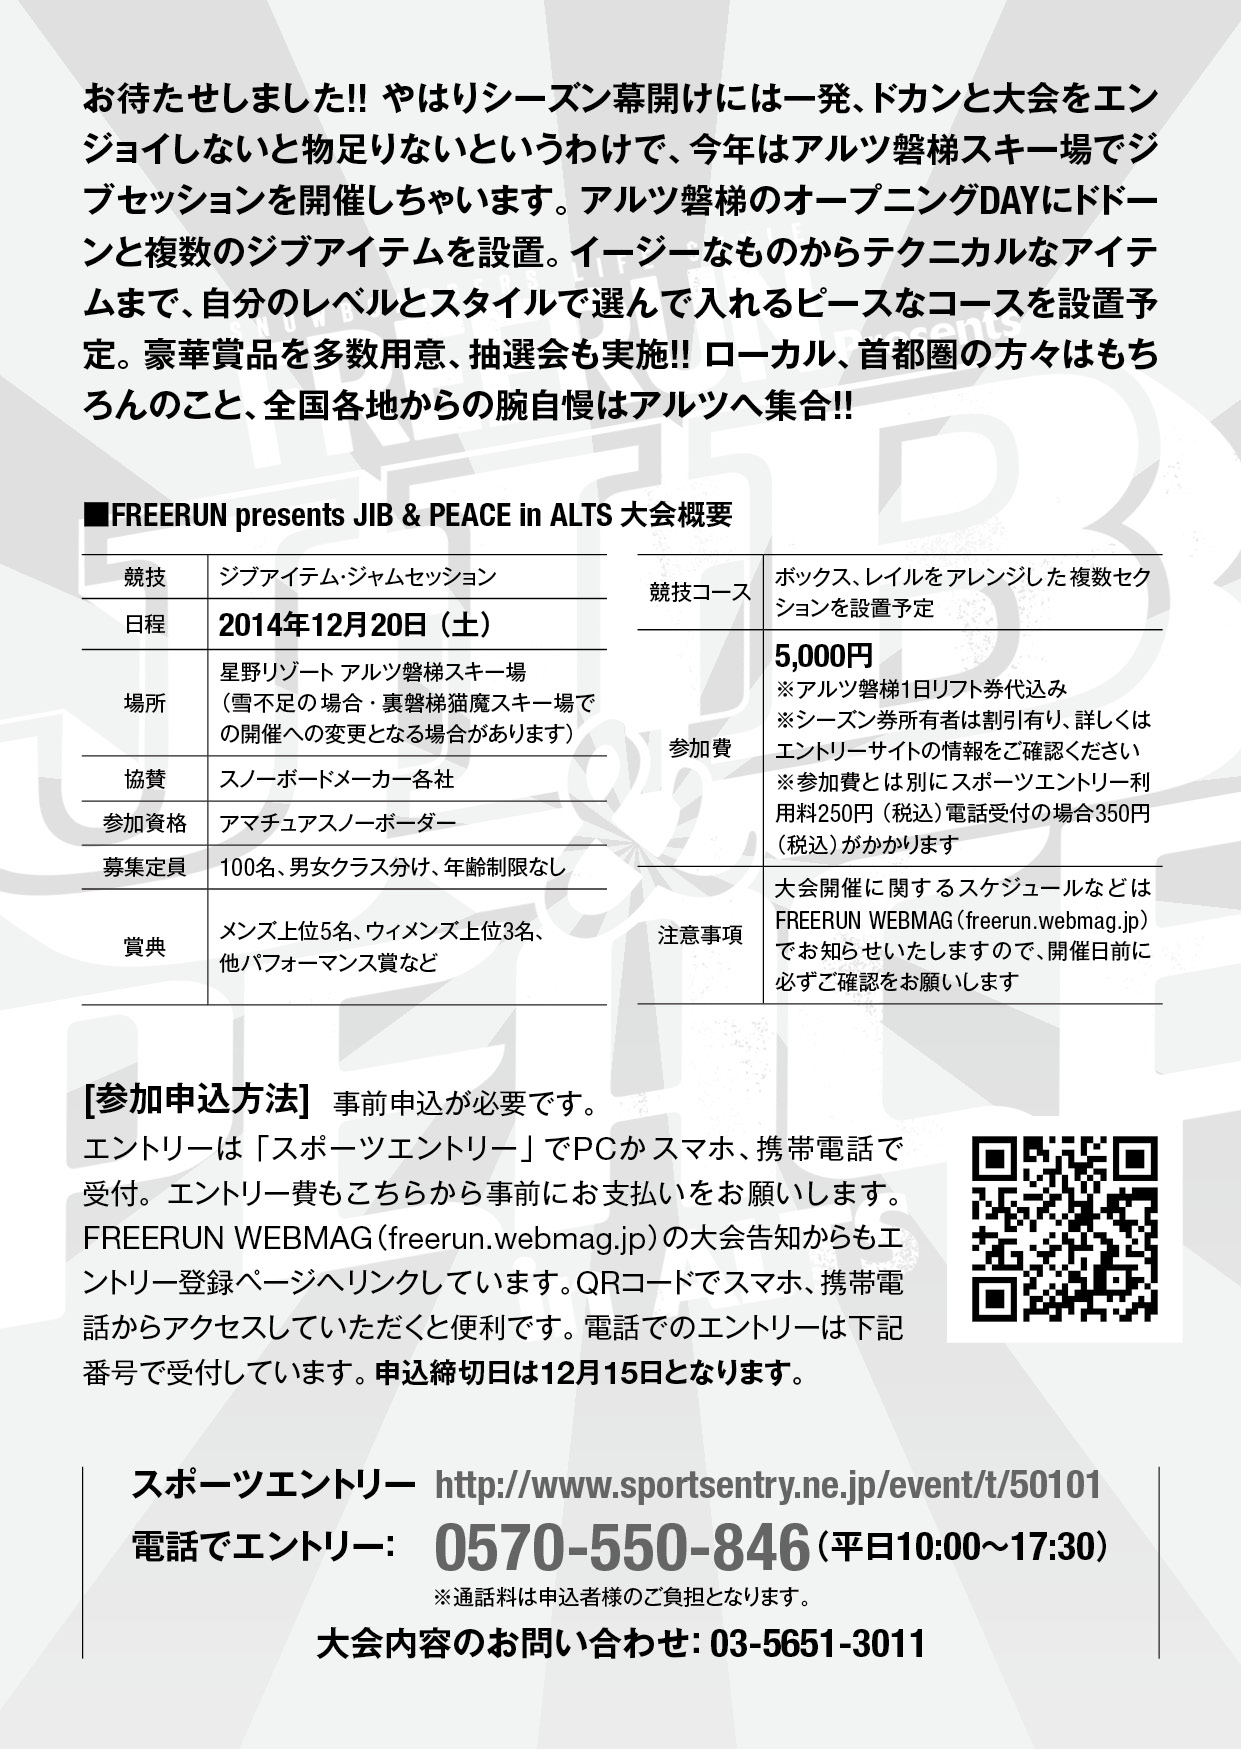 main-image_sub_FREERN_JIB&PEACE_Flyer2